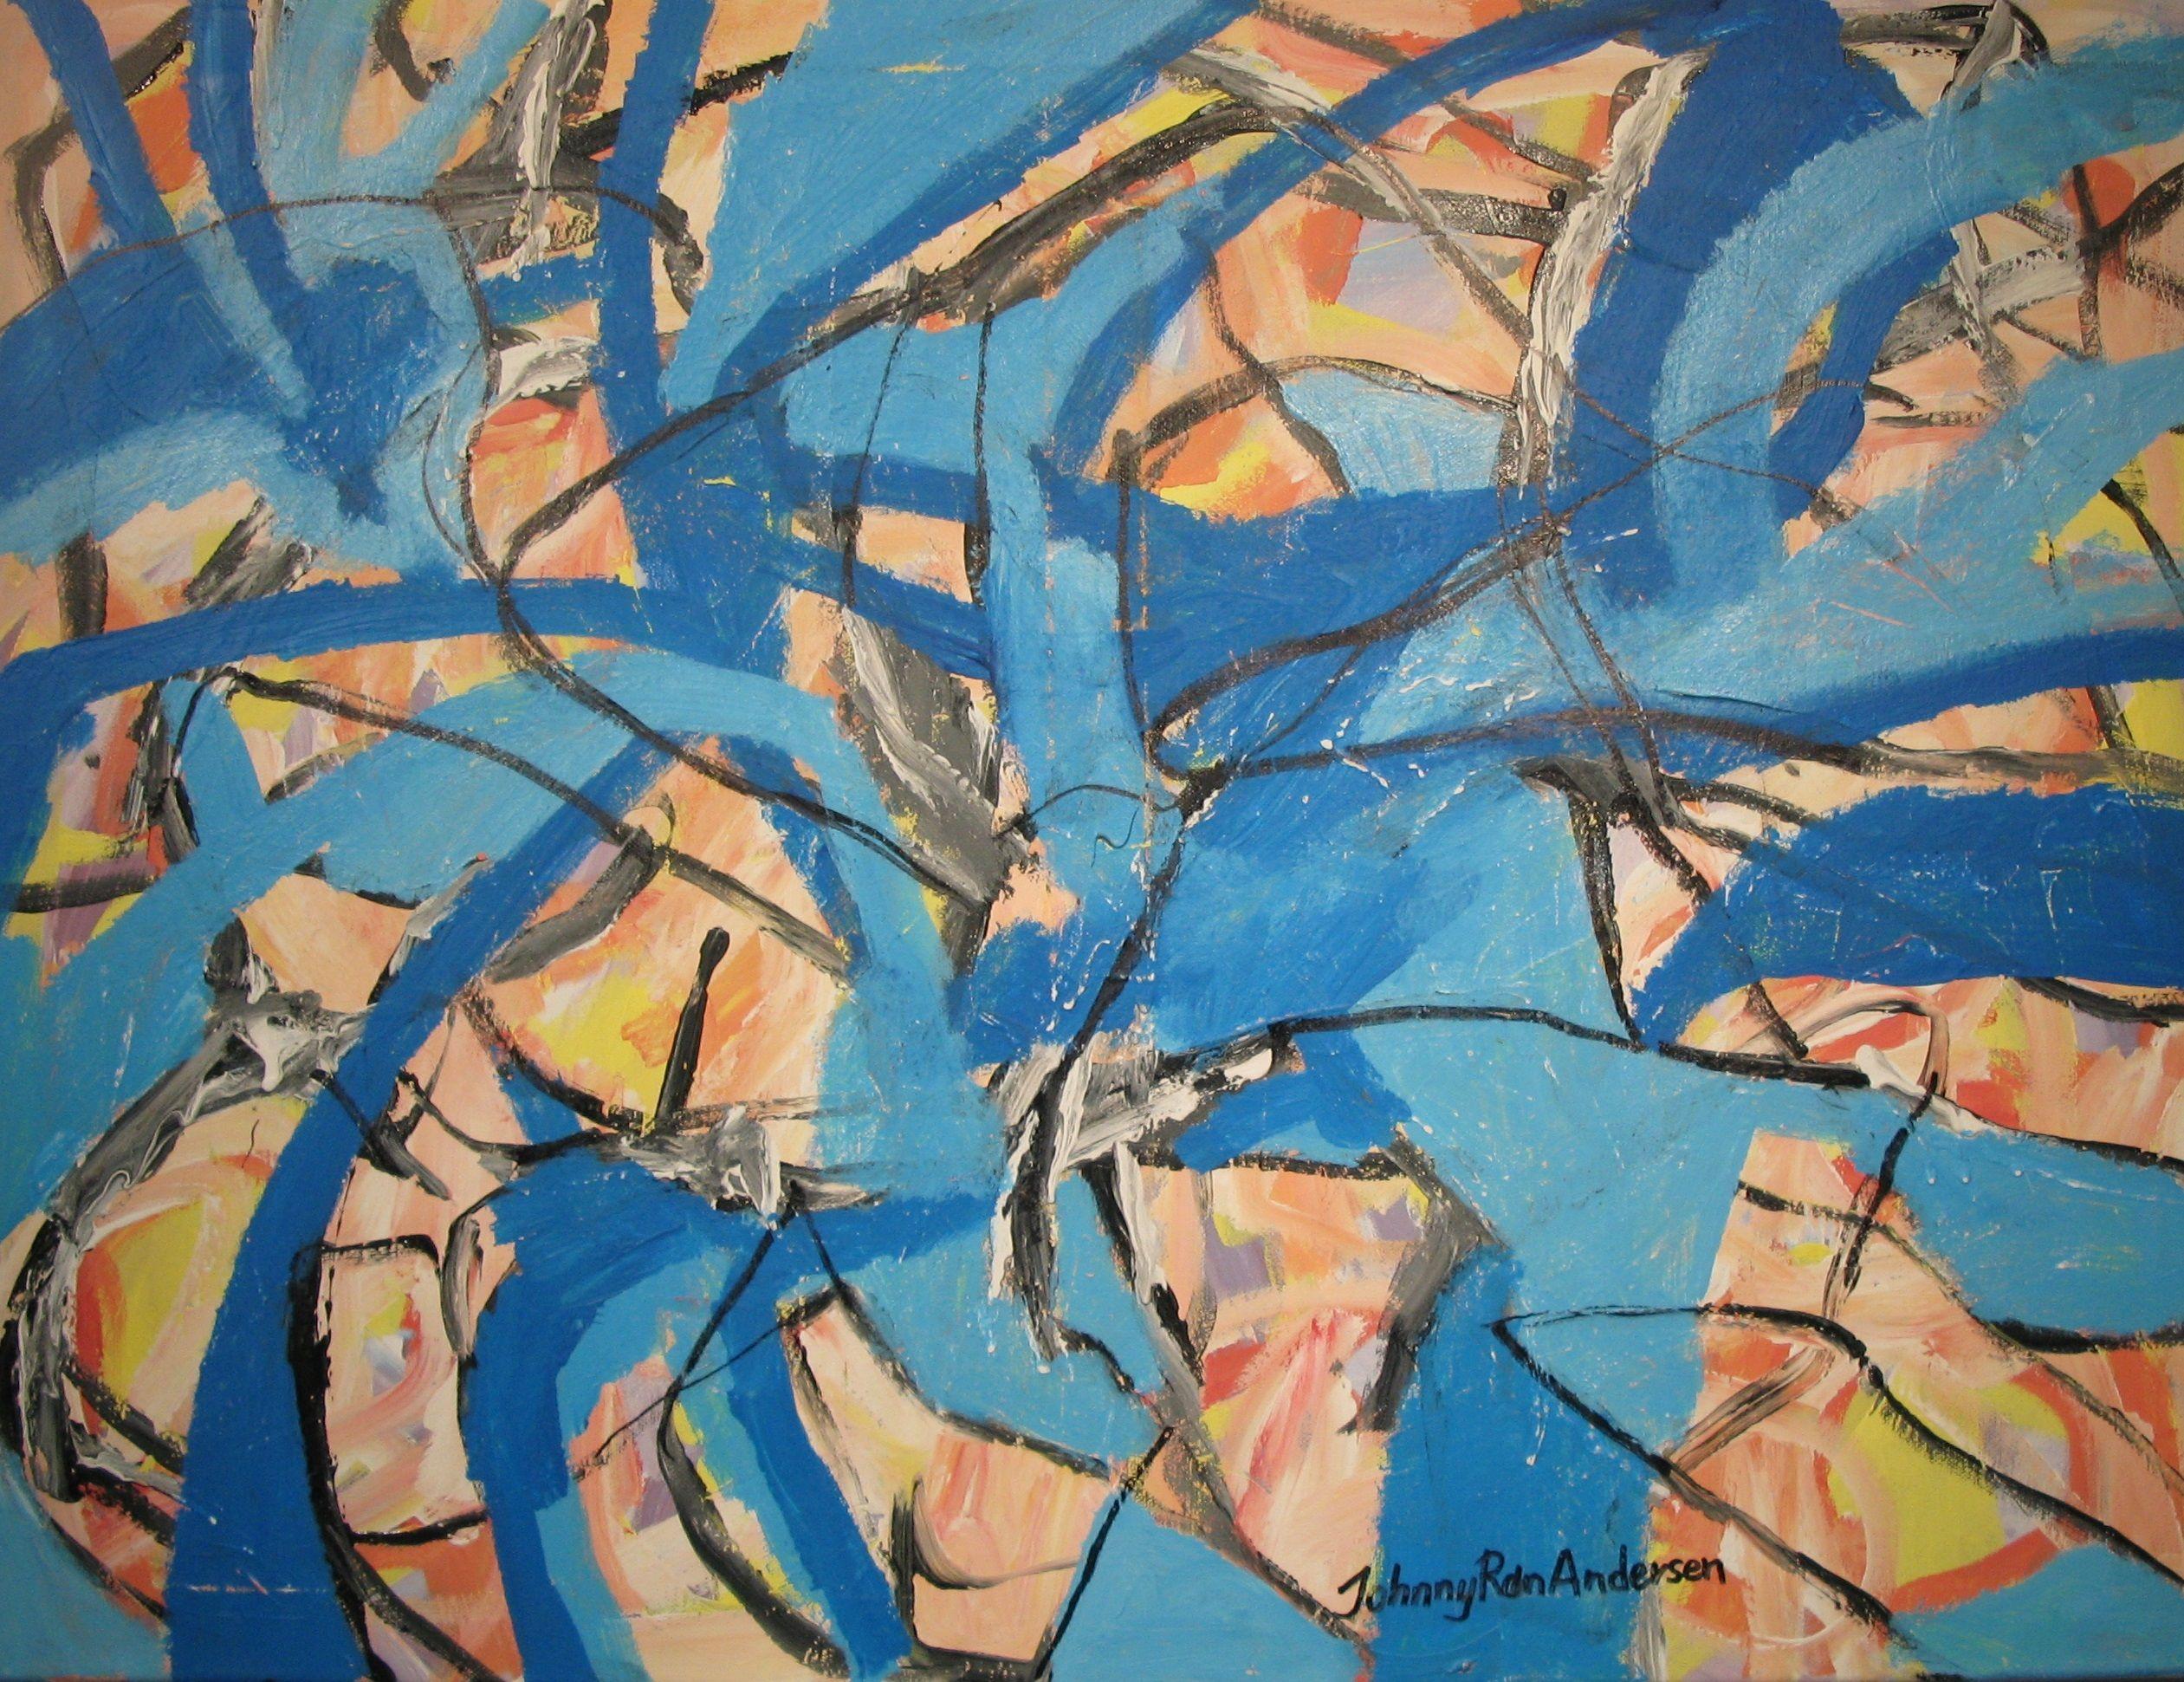 Maleri Blå energi 60x80 cm Johnny Røn Andersen